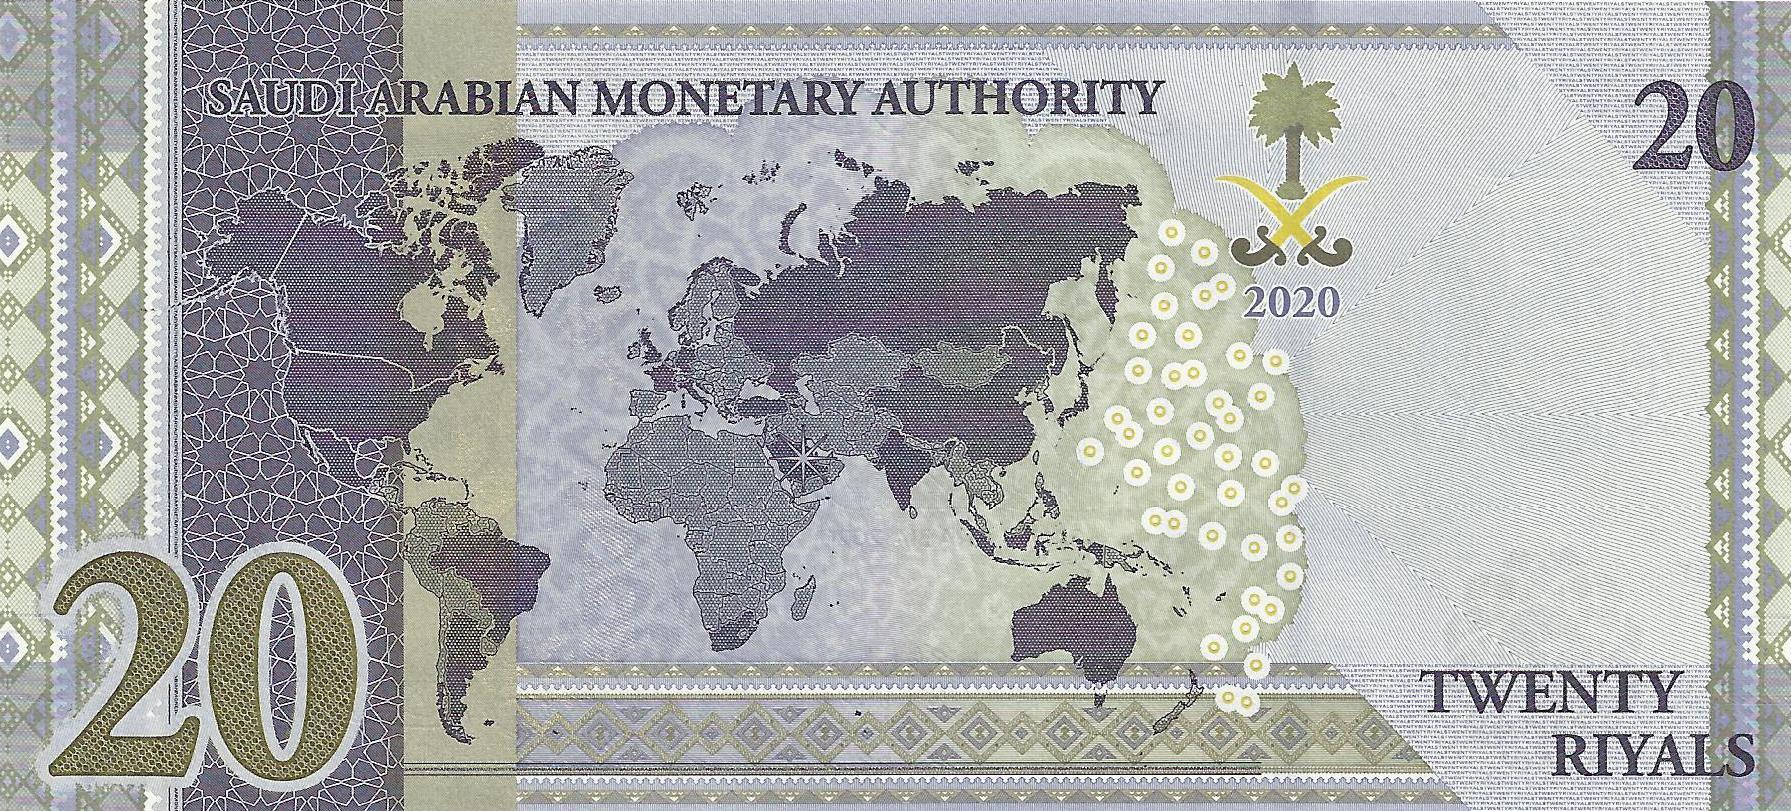 Saudi Arabia new 20-riyal commemorative note (B142a) confirmed – BanknoteNews